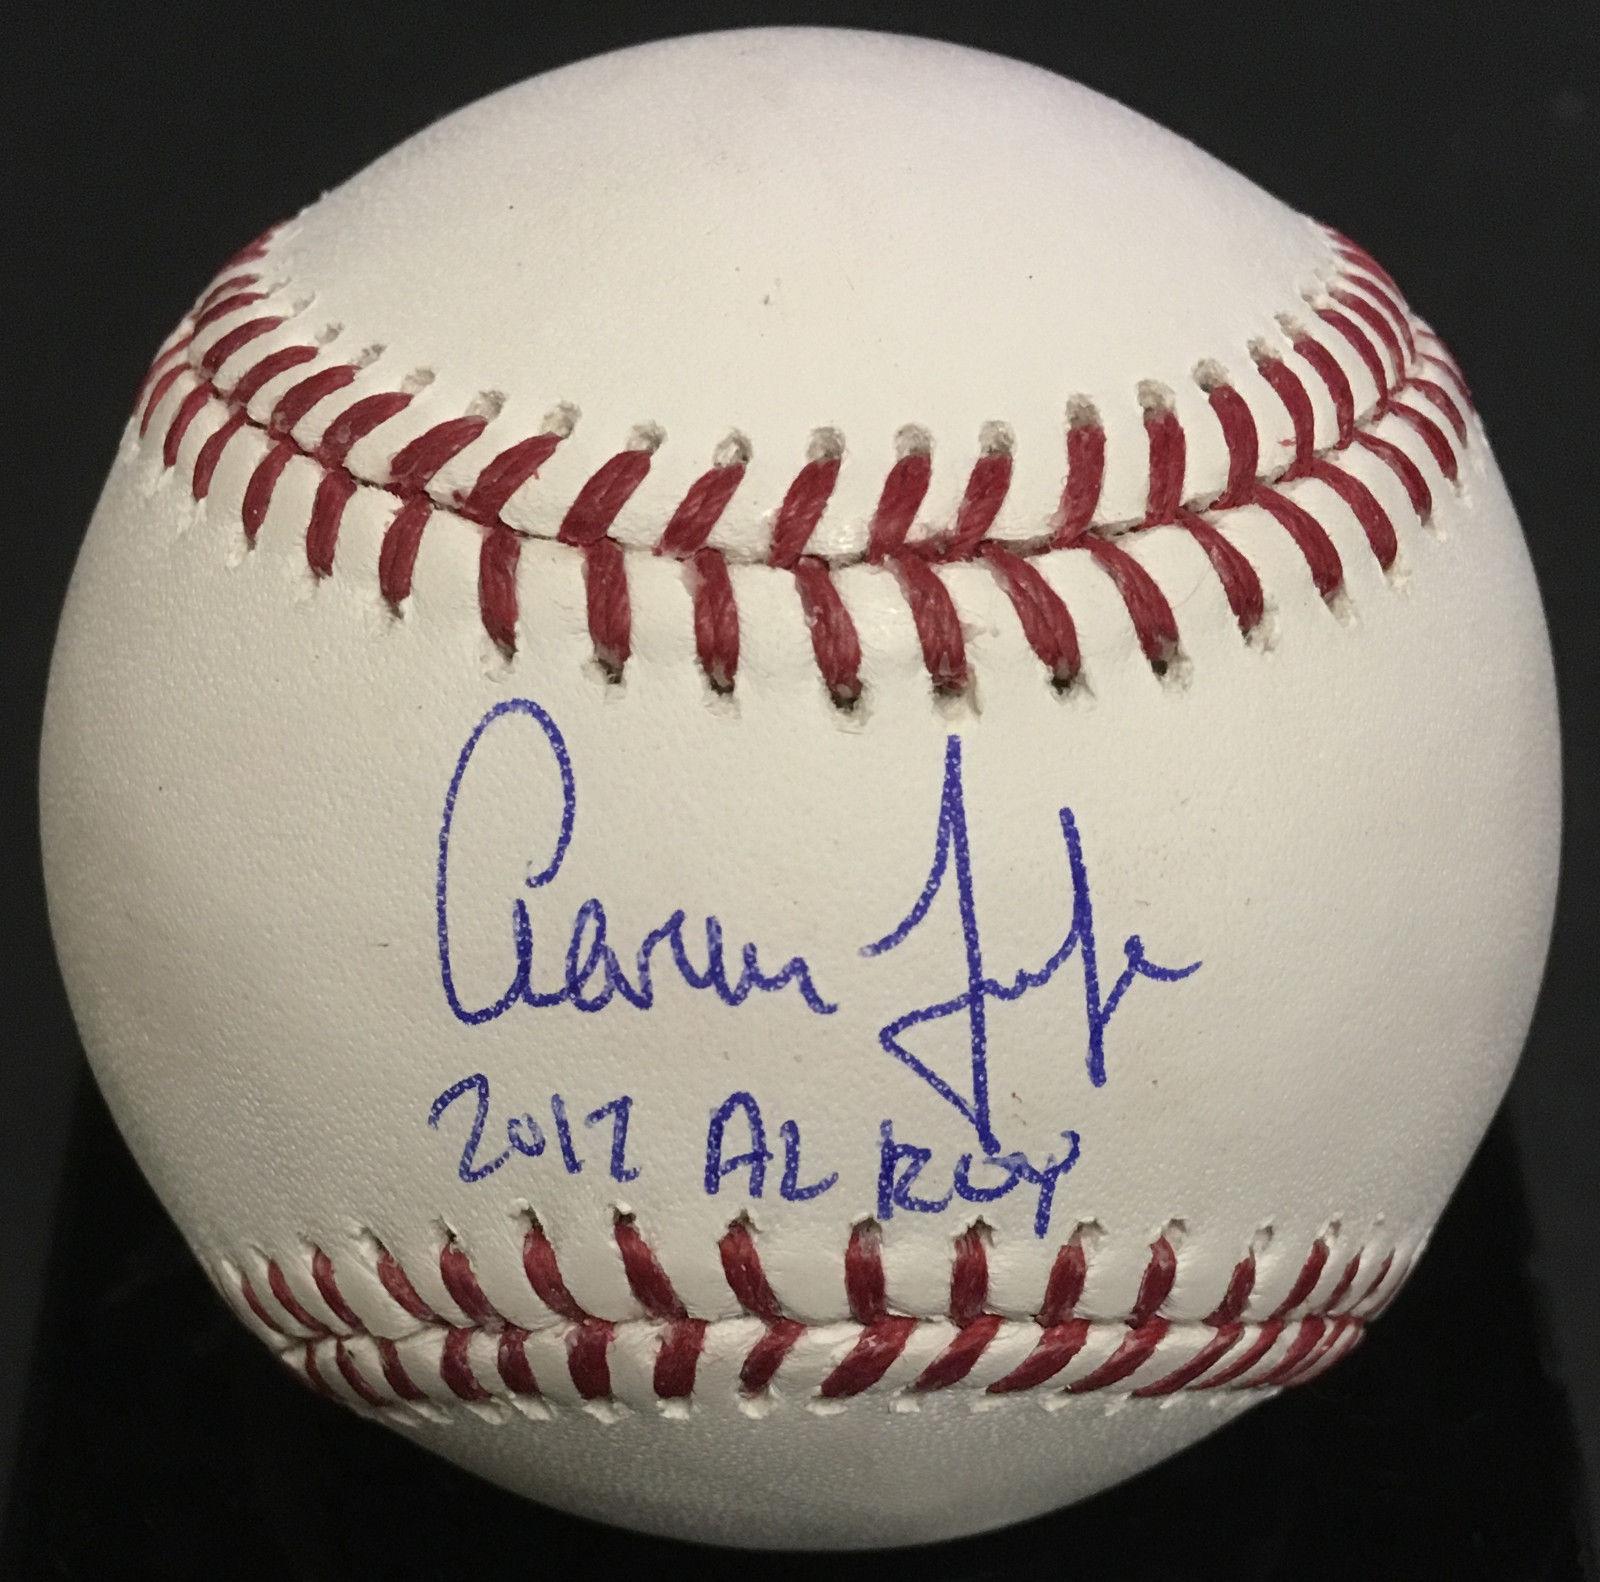 AARON JUDGE signed baseball ins 2017 AL ROY rookie auto fanatics MLB coa Yankees